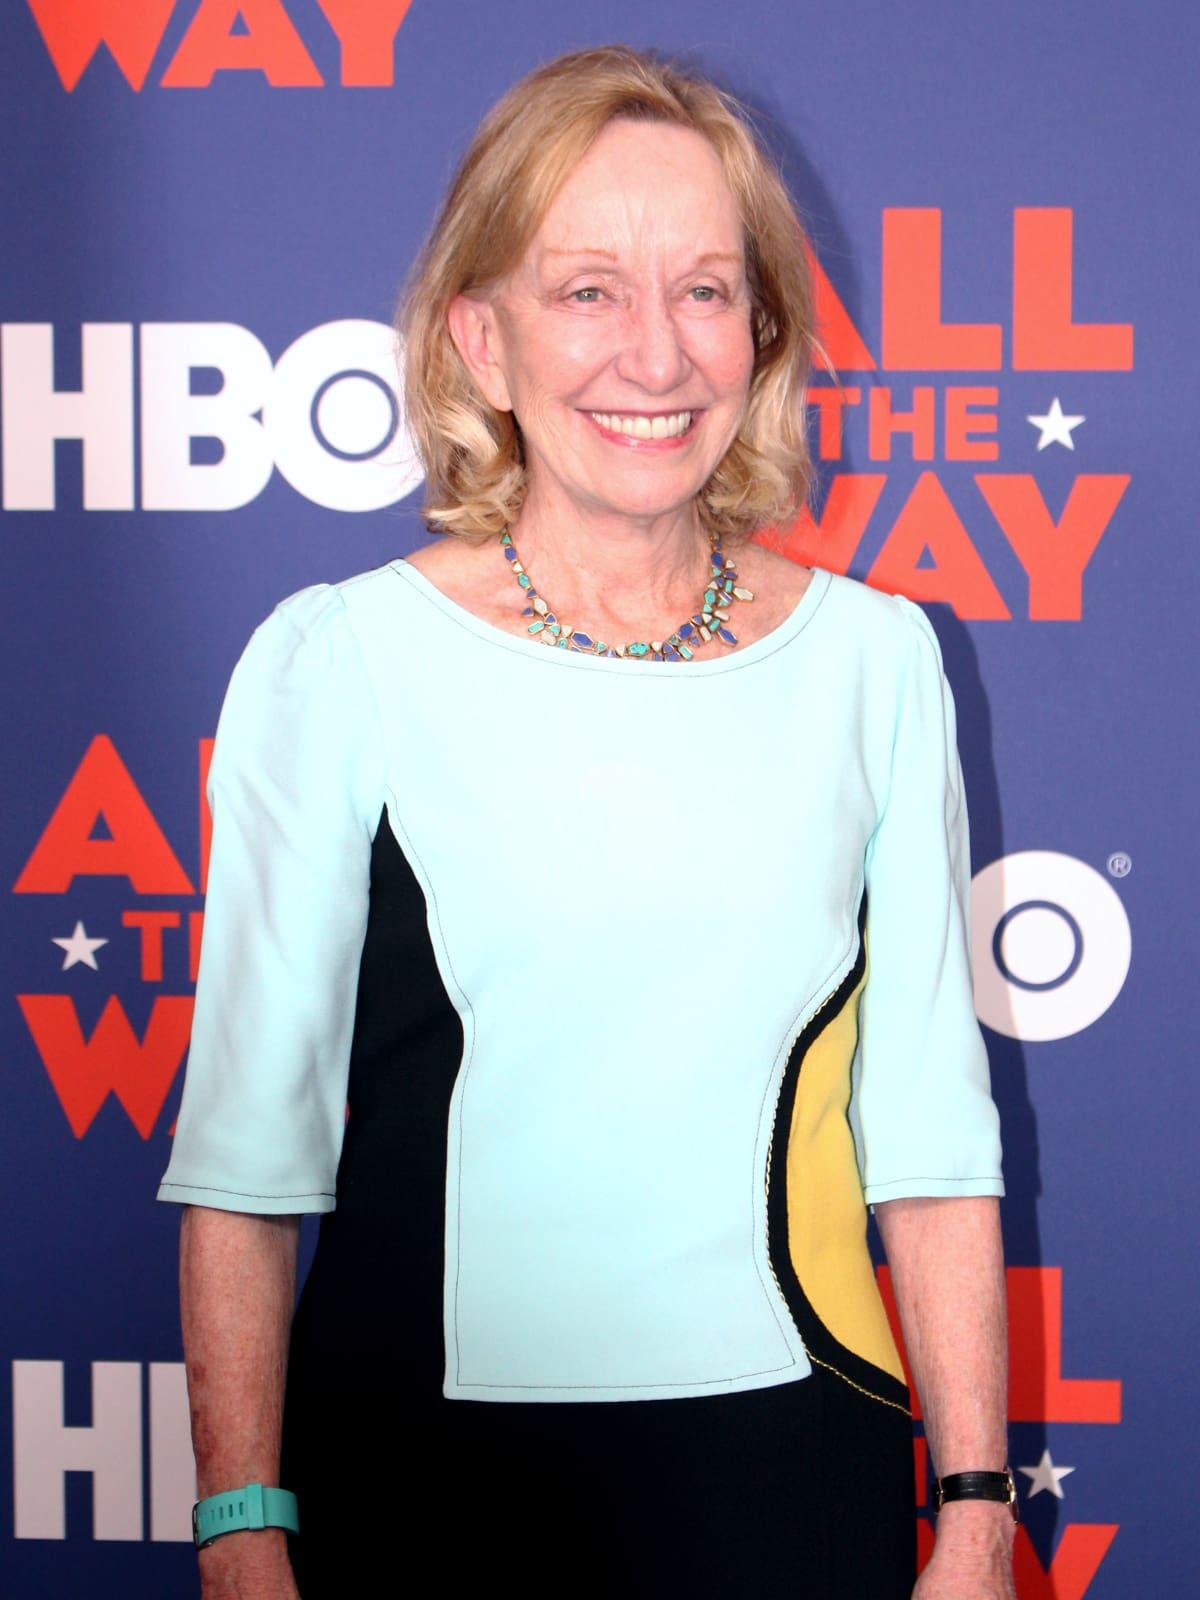 Austin premiere HBO film All the Way LBJ red carpet Doris Kearns Goodwin